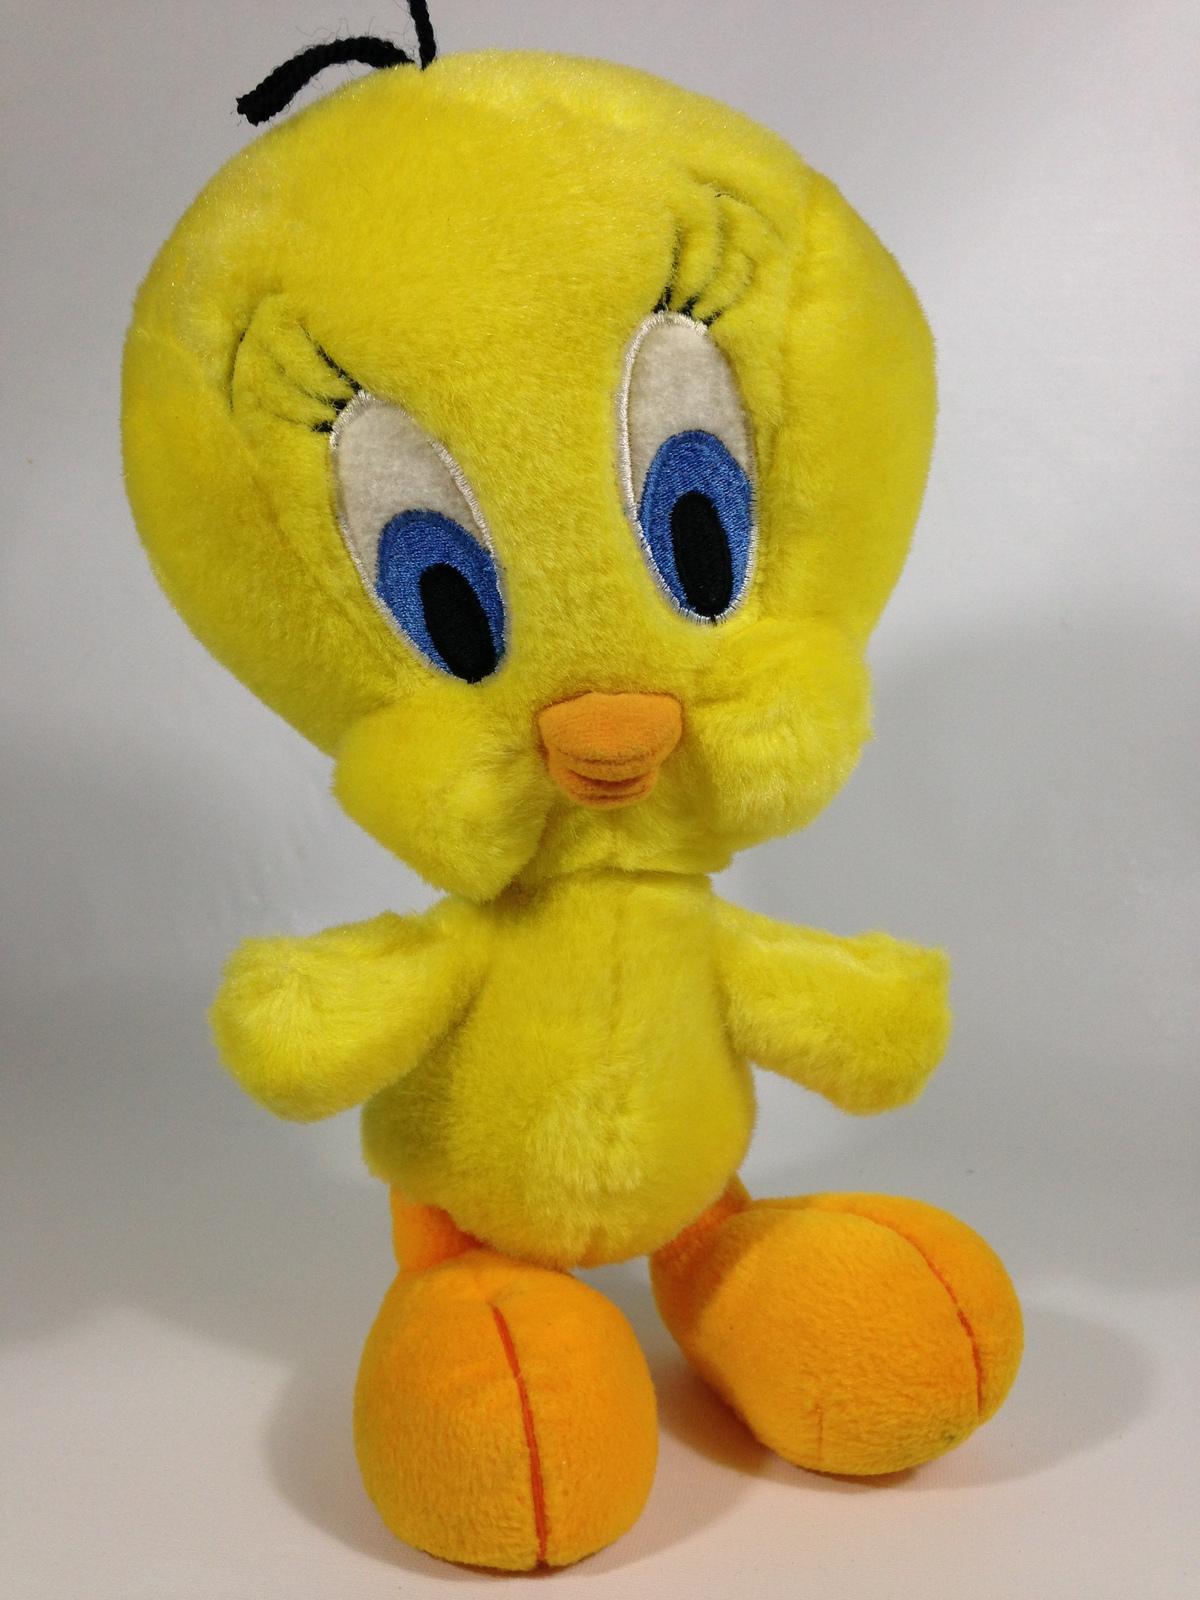 Tweety Bird Plush Vintage Warner Brothers And 50 Similar Items